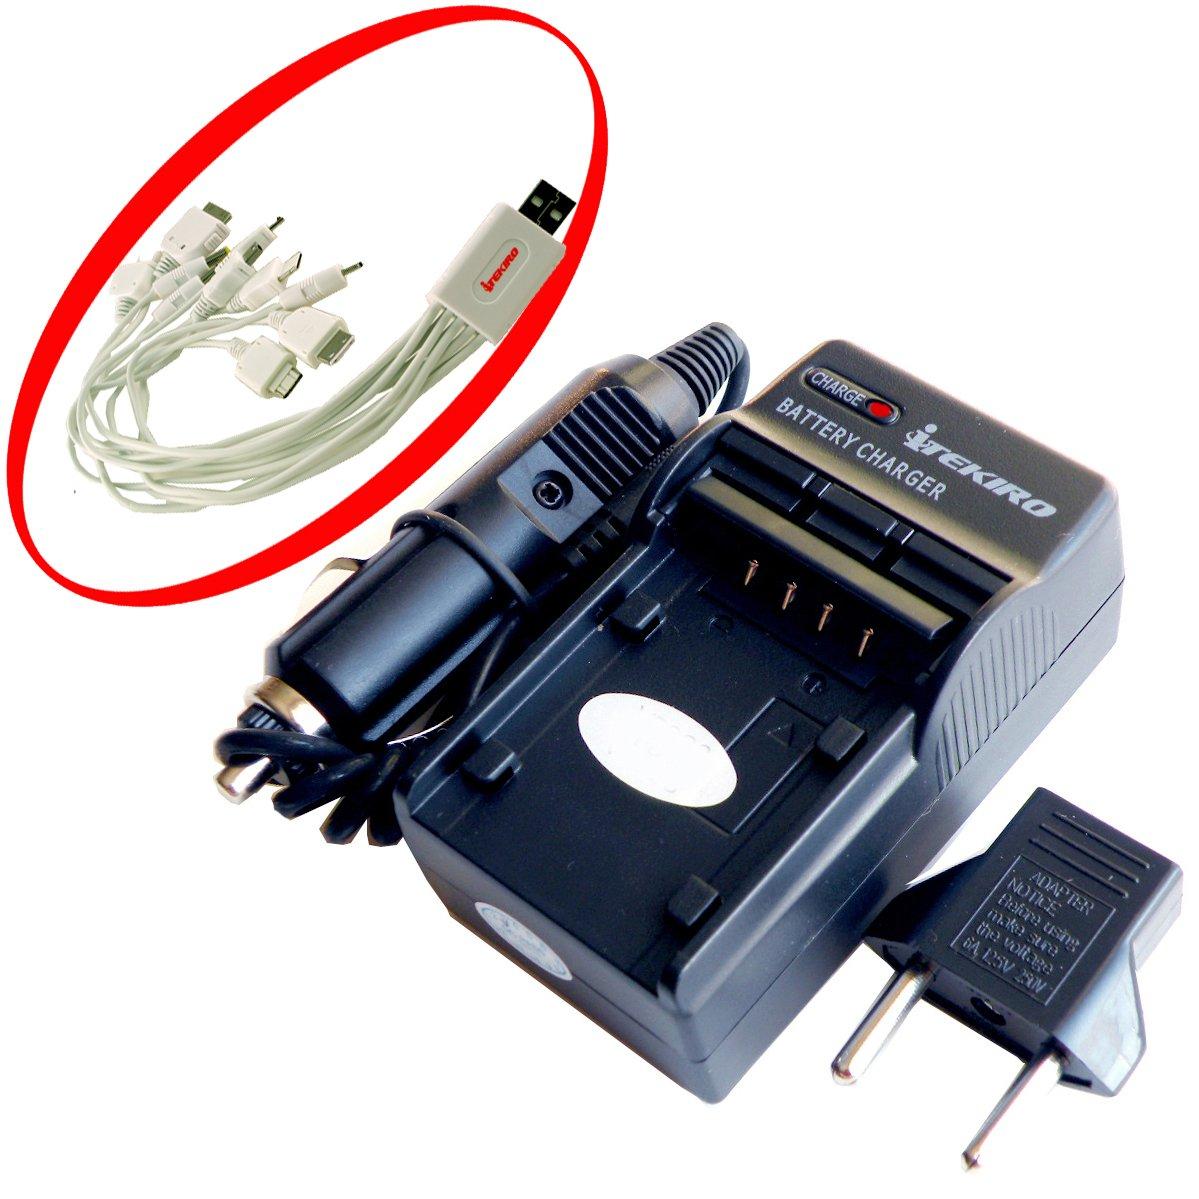 iTEKIRO AC壁DCカーバッテリー充電器キットfor Polaroid cta-00730s + iTEKIRO 10-in-1 USB充電ケーブル   B003H35O9Y